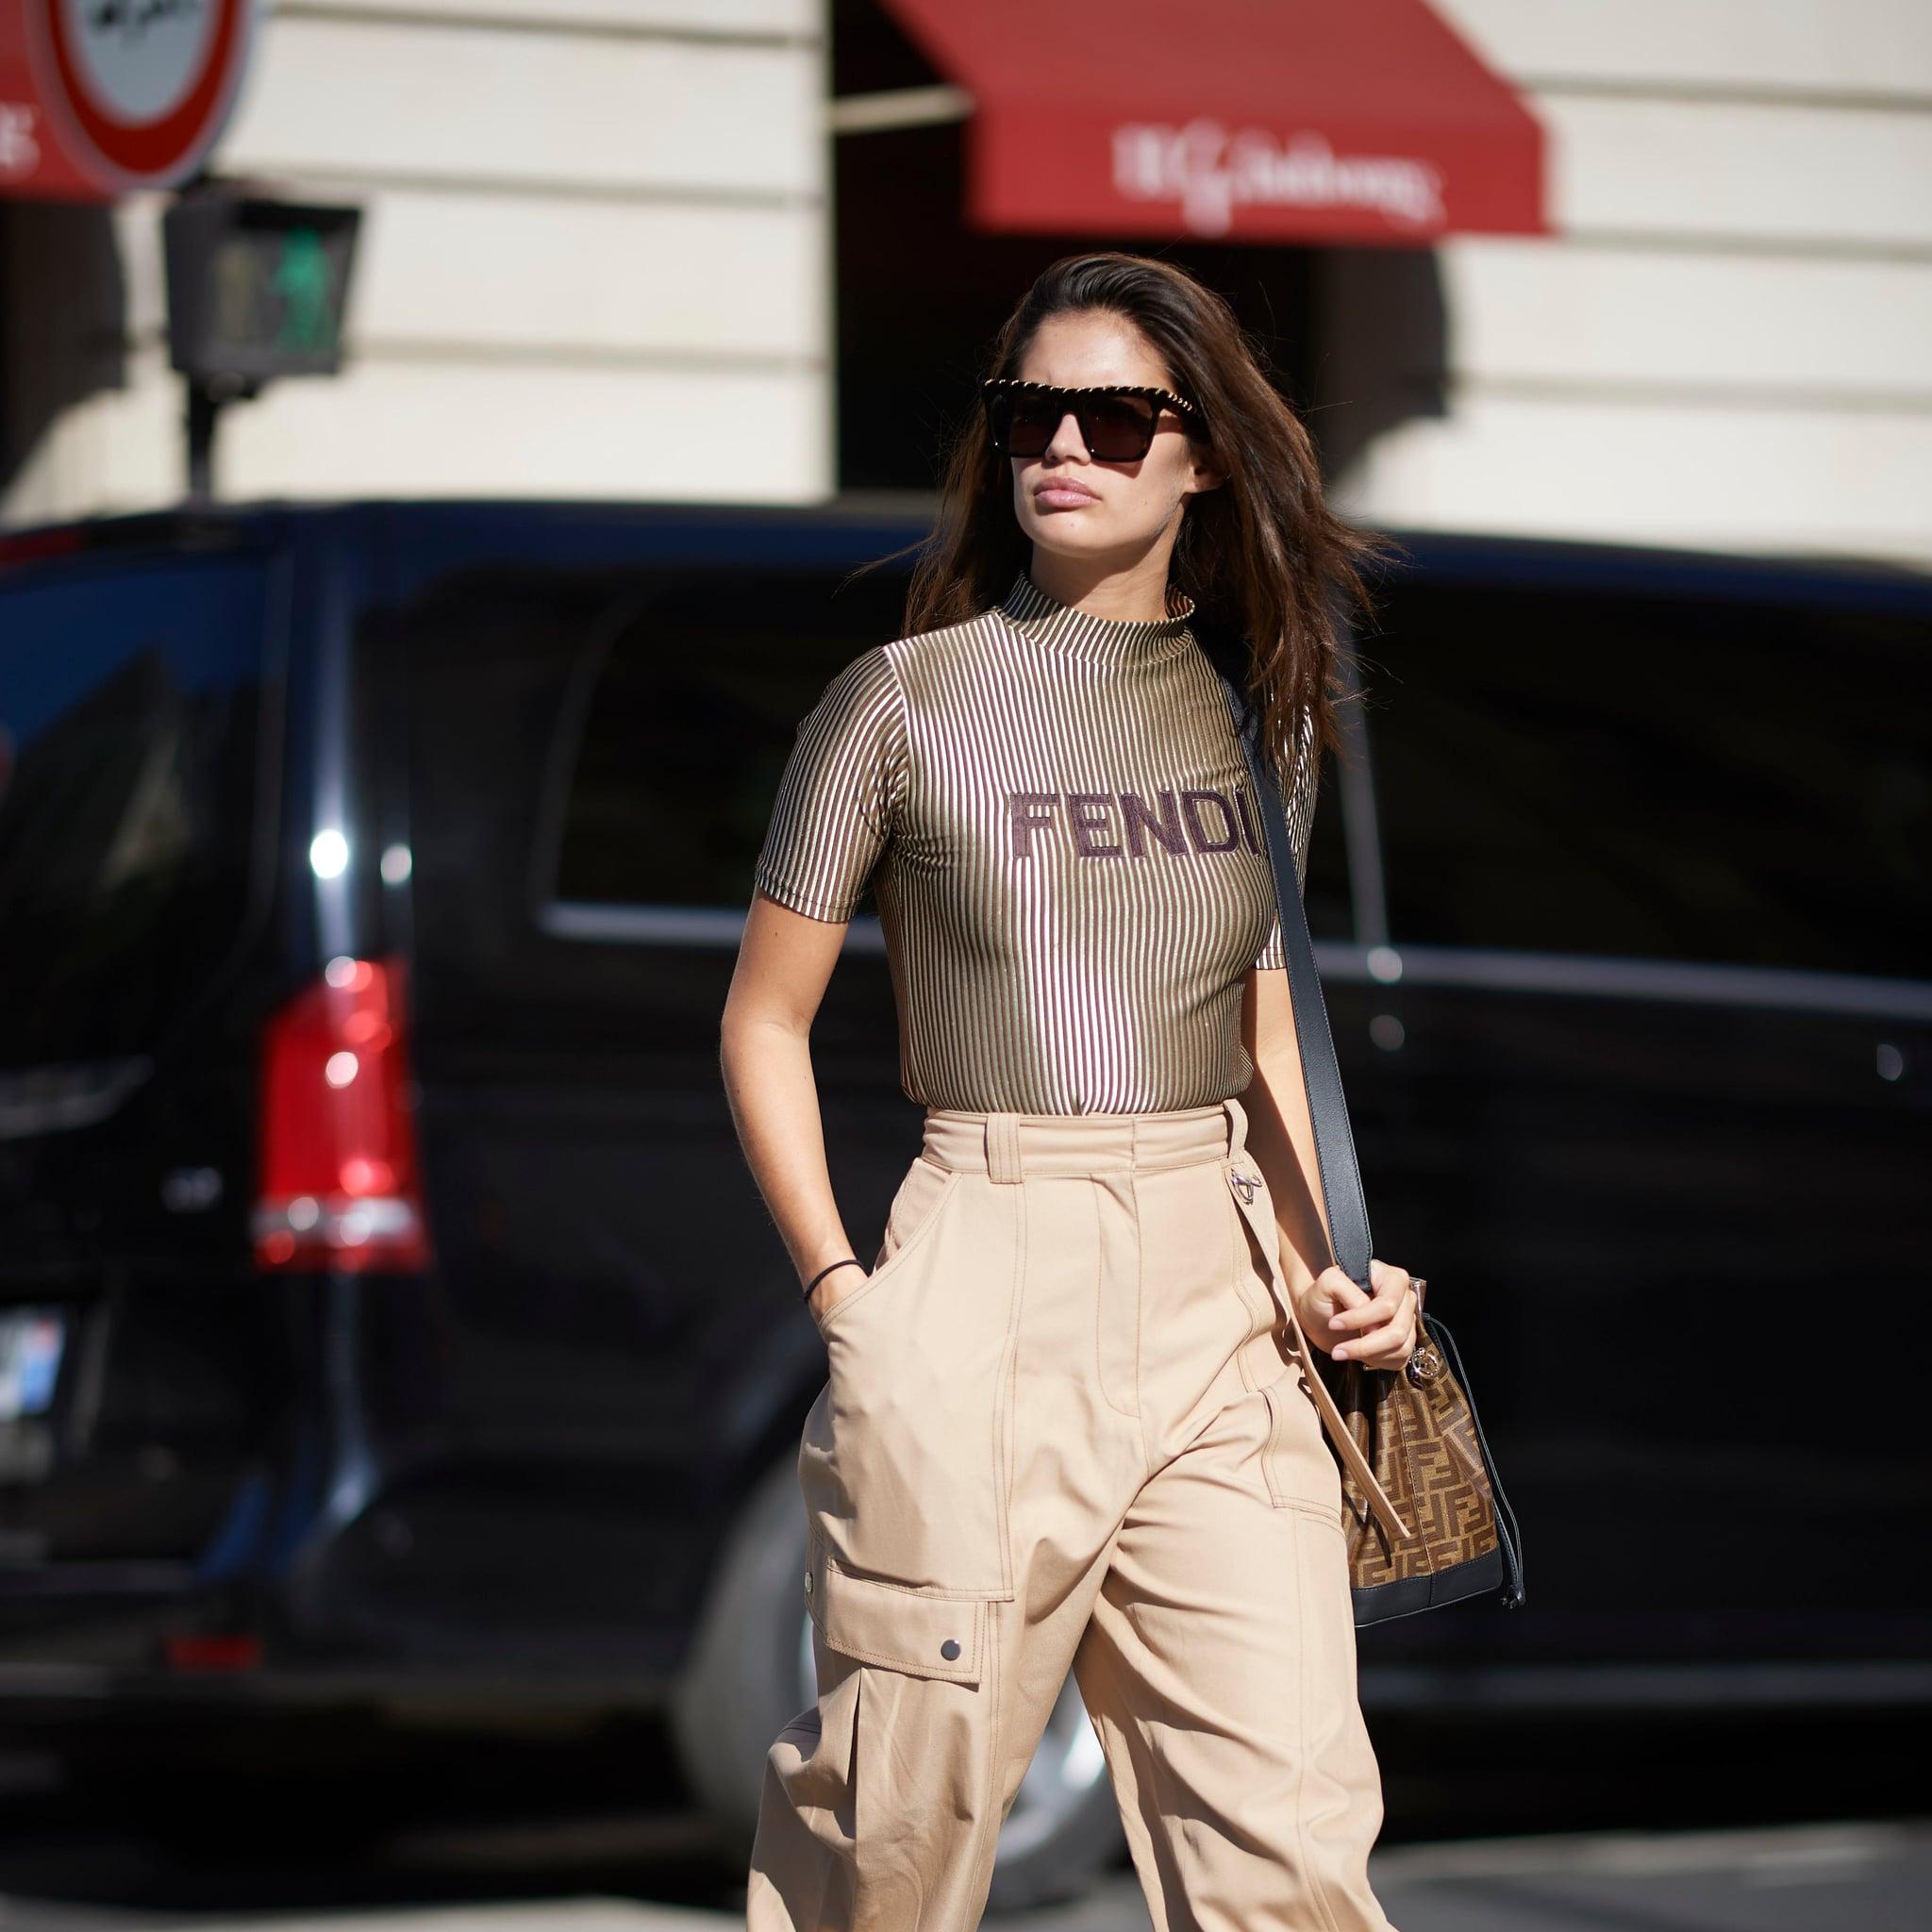 818e894df3d Model Street Style at Fashion Week Spring 2019 | POPSUGAR Fashion